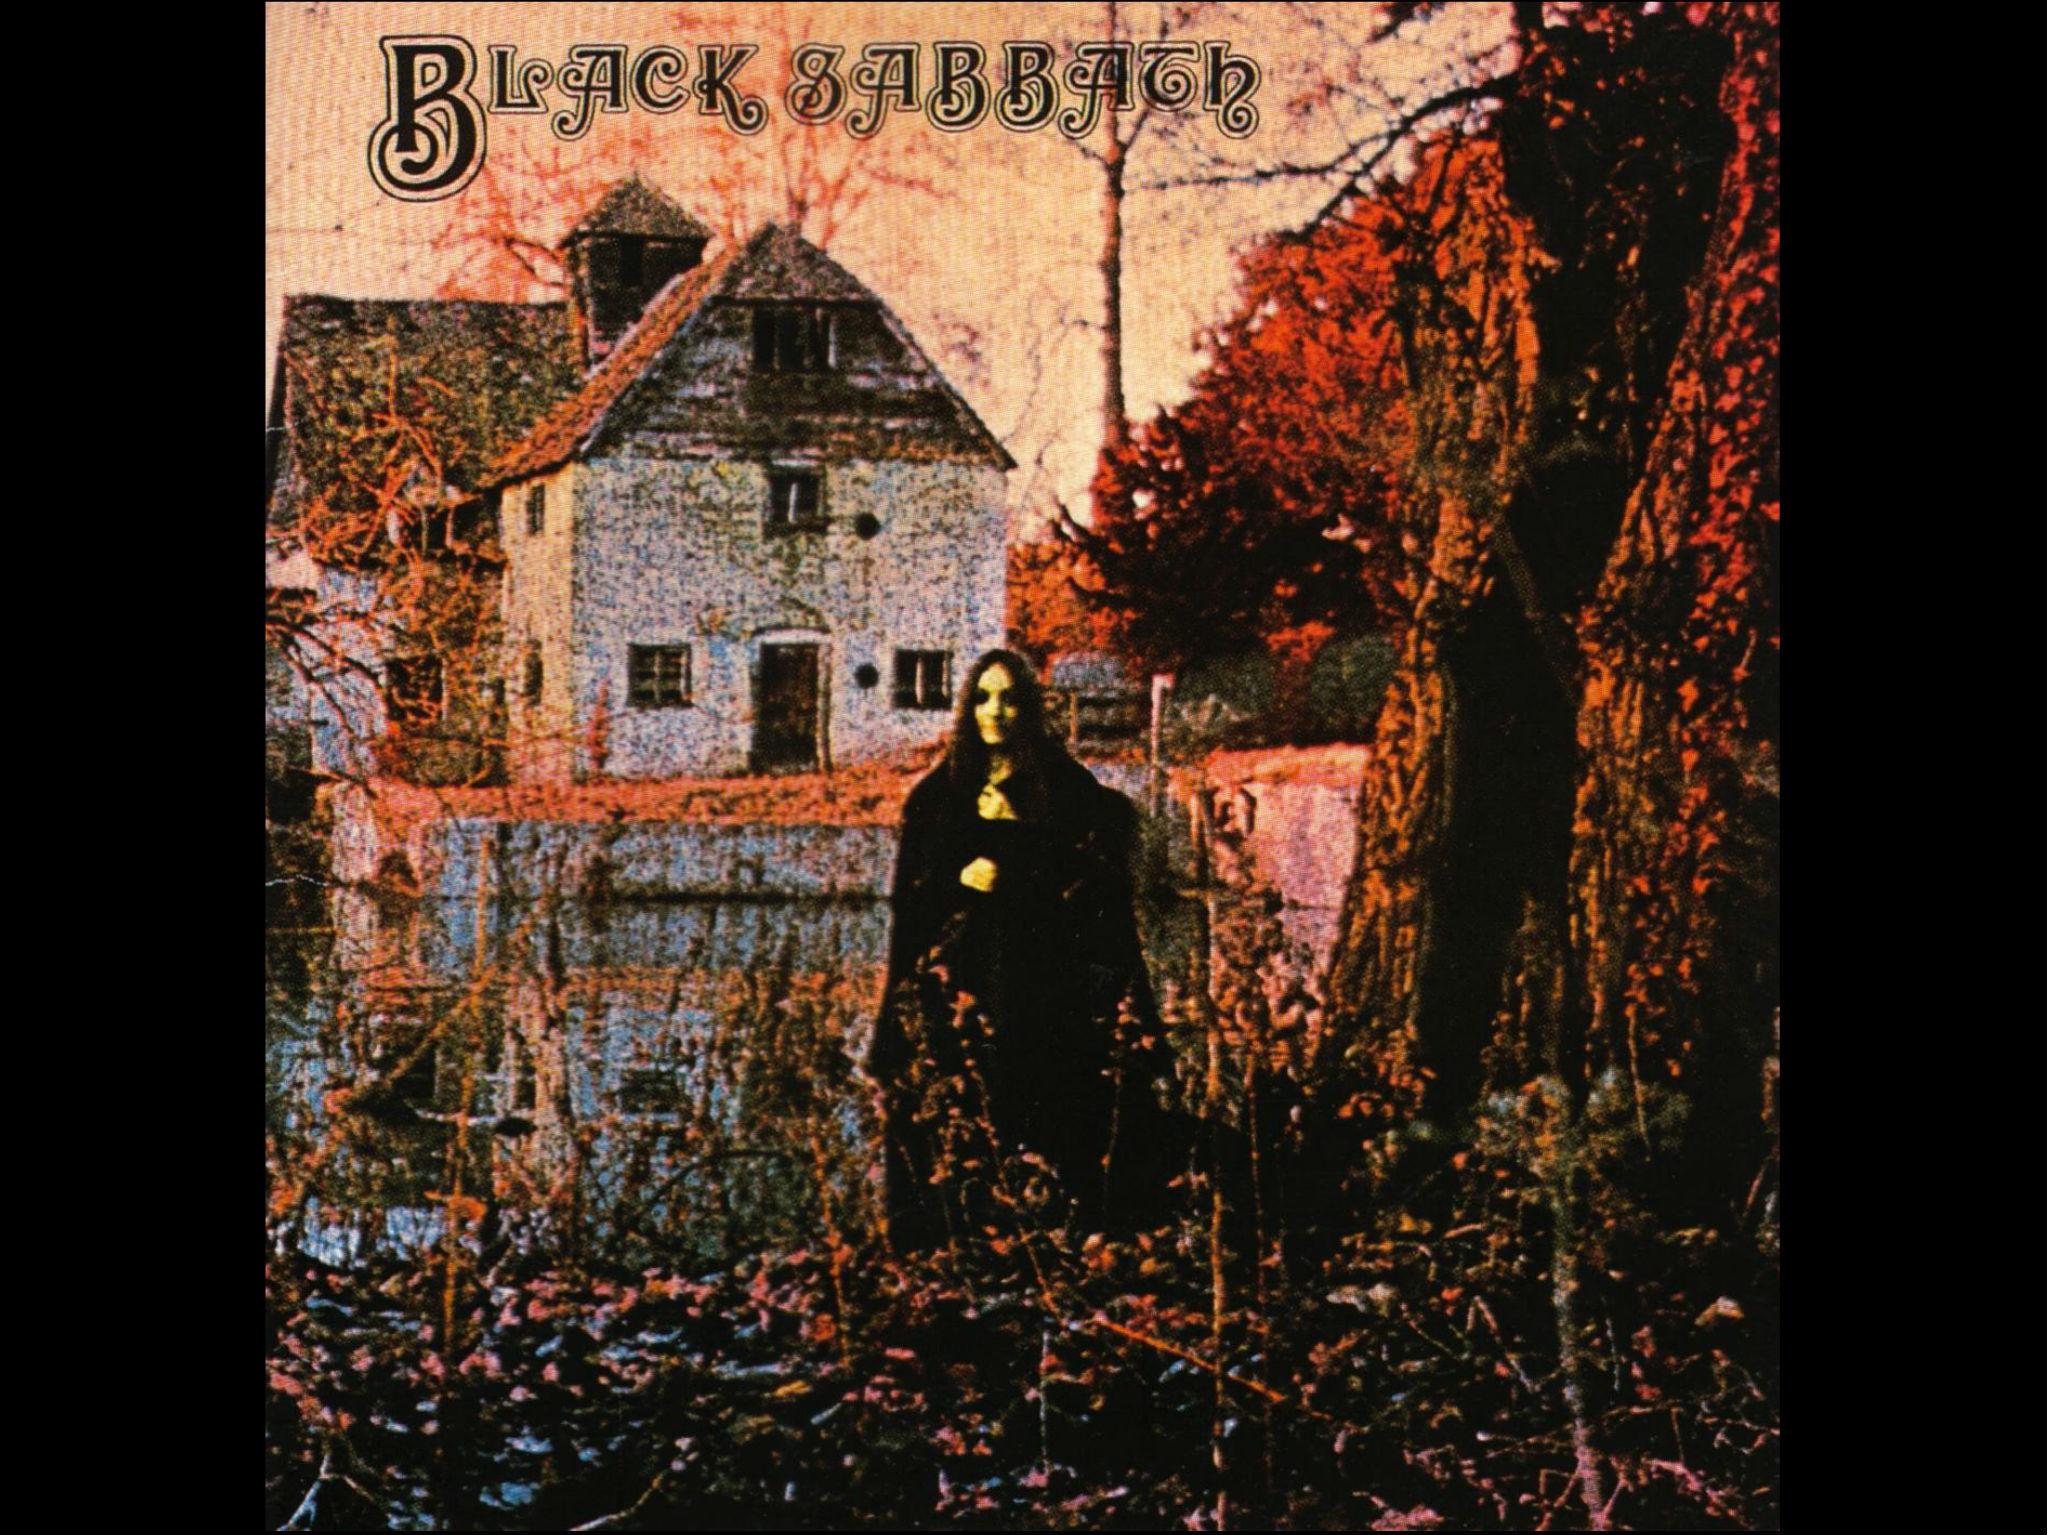 Black Sabbath (Black Sabbath, 1970)